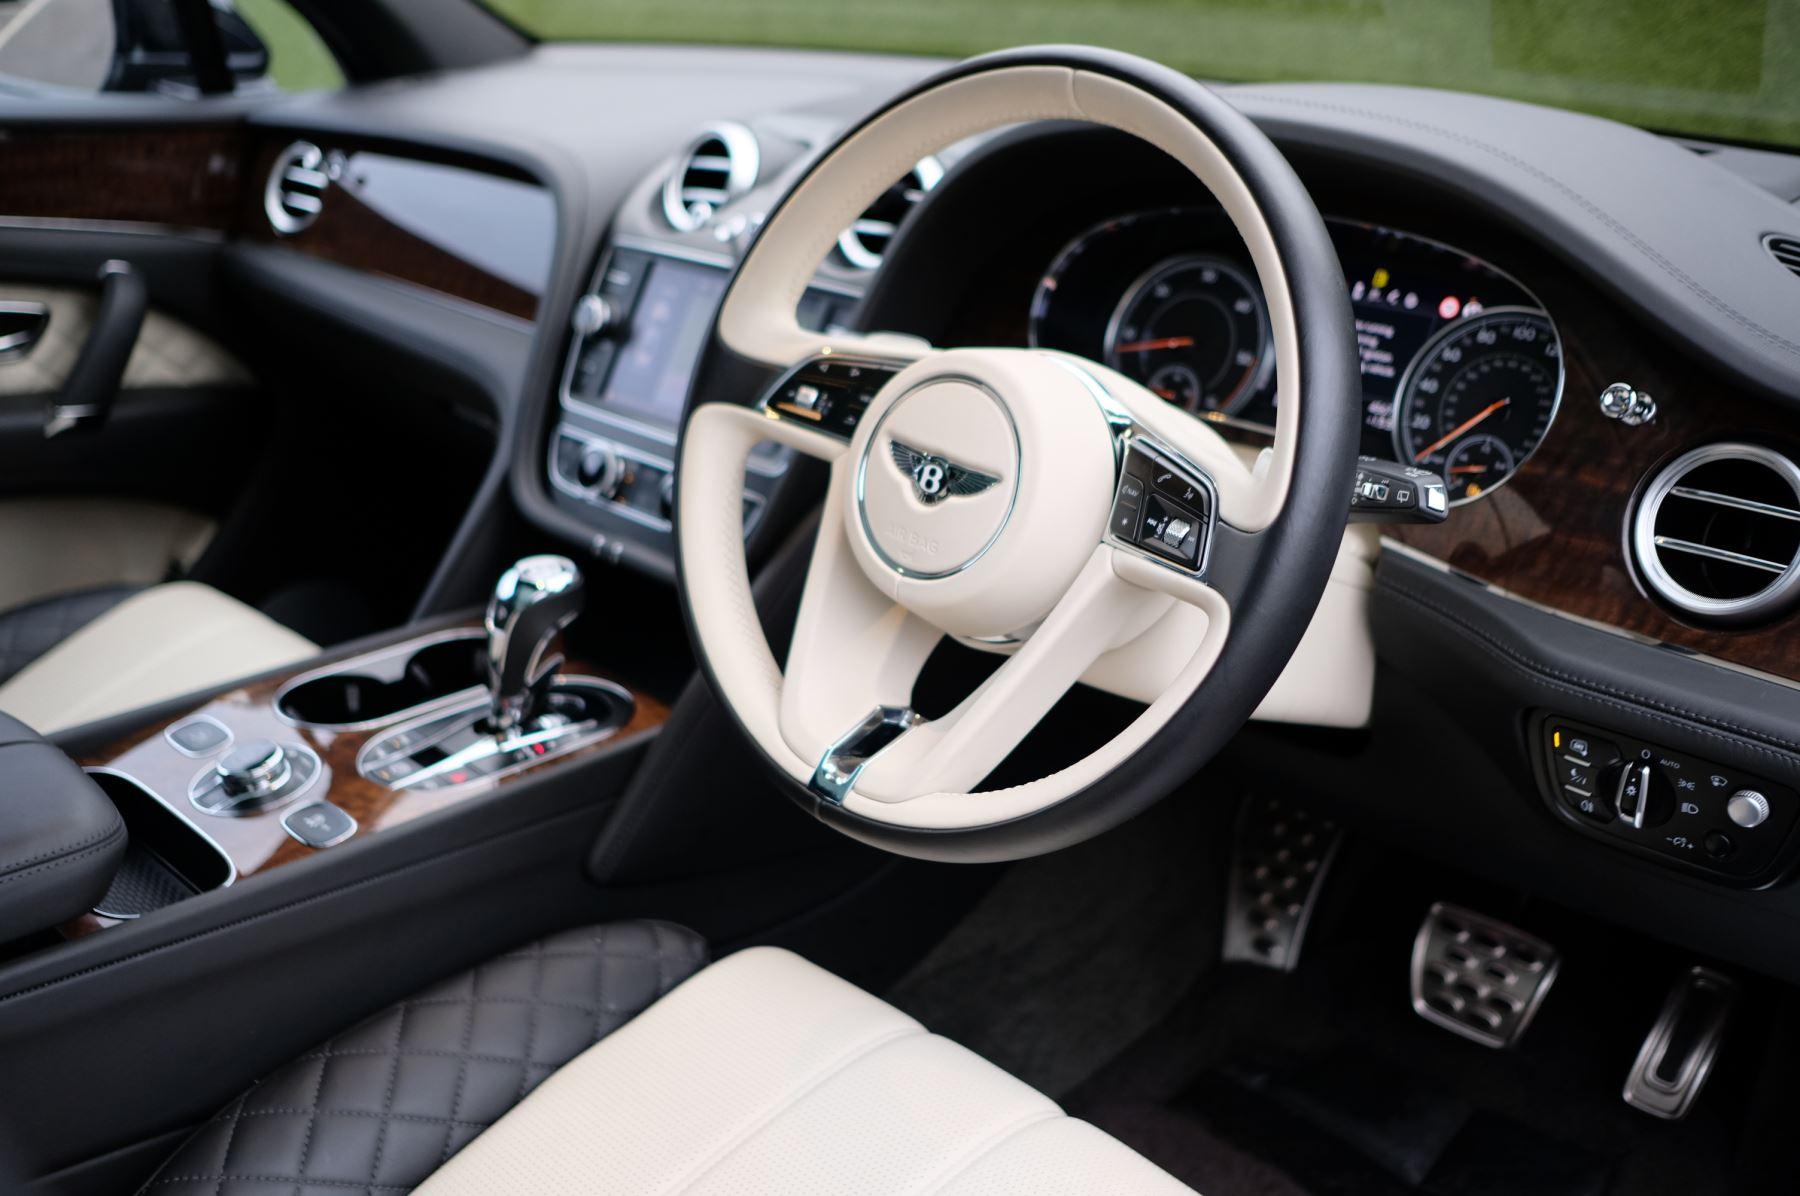 Bentley Bentayga Diesel 4.0 V8 Mulliner Driving Spec 5dr Auto - 7 Seat Specification image 12